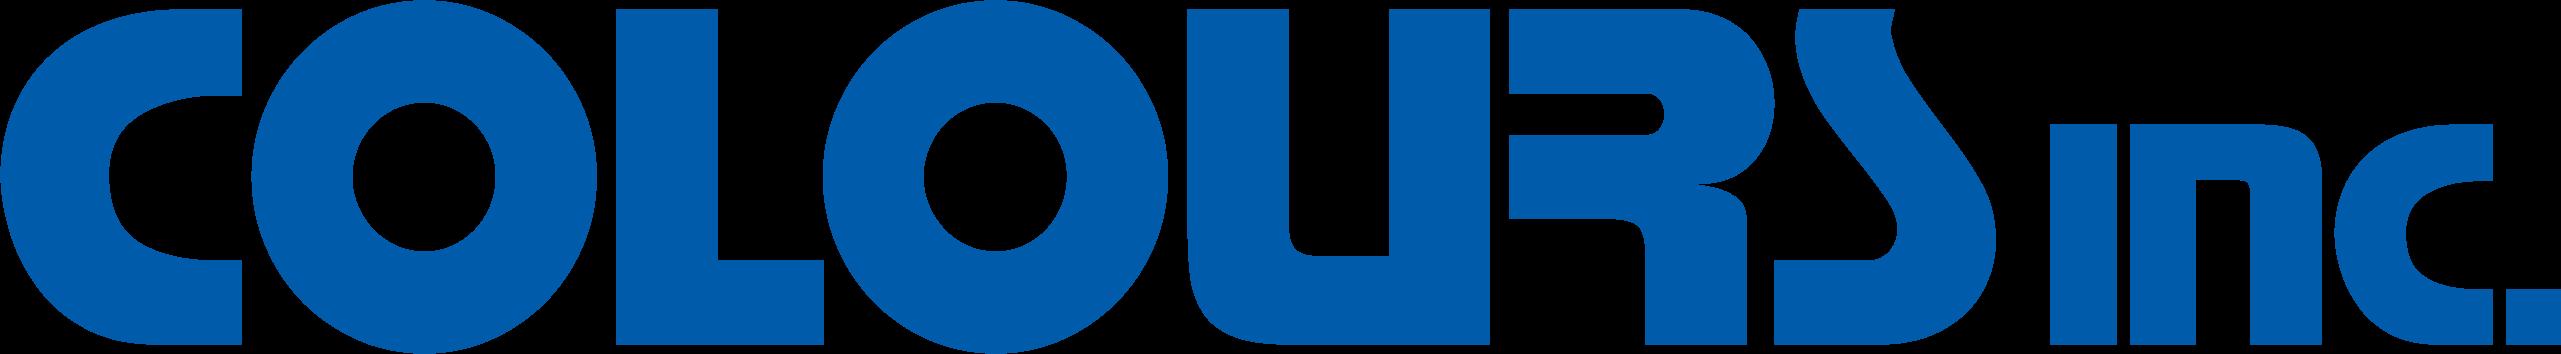 Event Preregistration - Colours, Inc. Company Logo